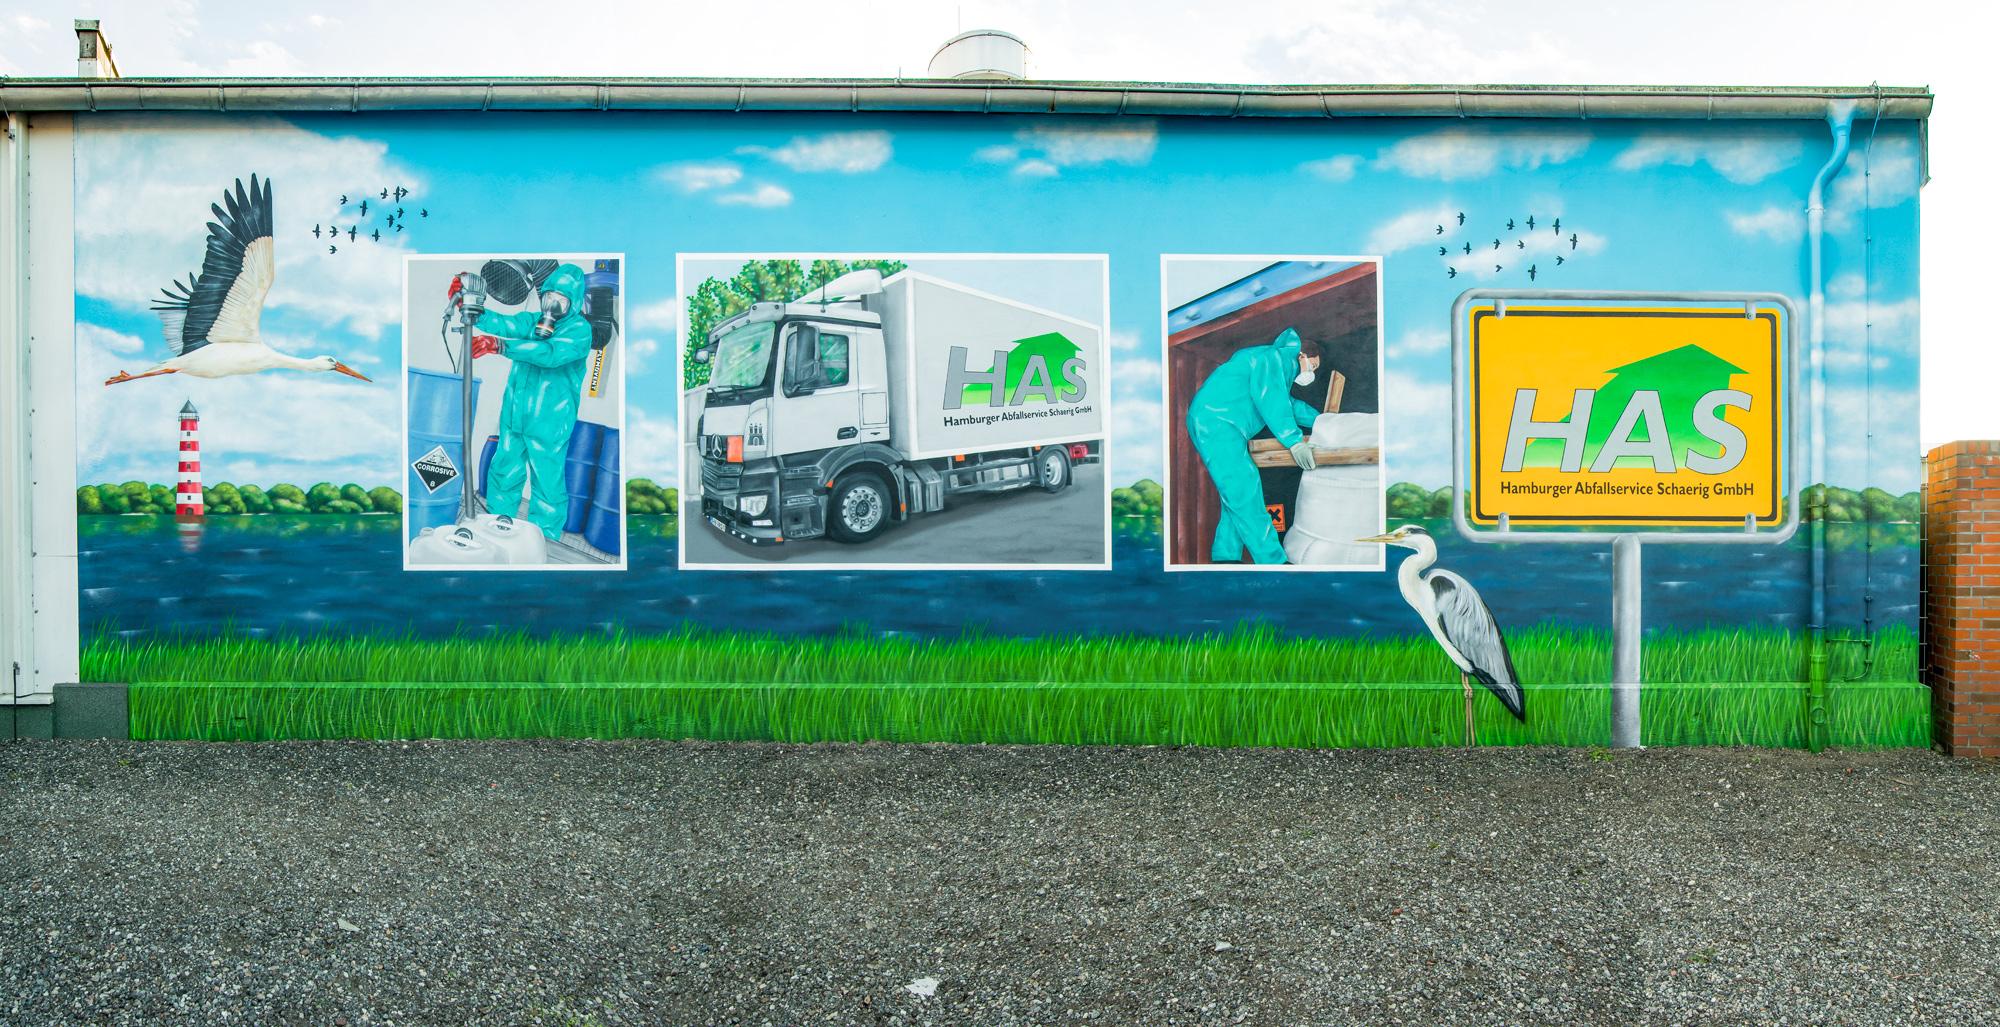 Graffiti Sprüher Hausfassade - Fassadengestaltung Hamburg